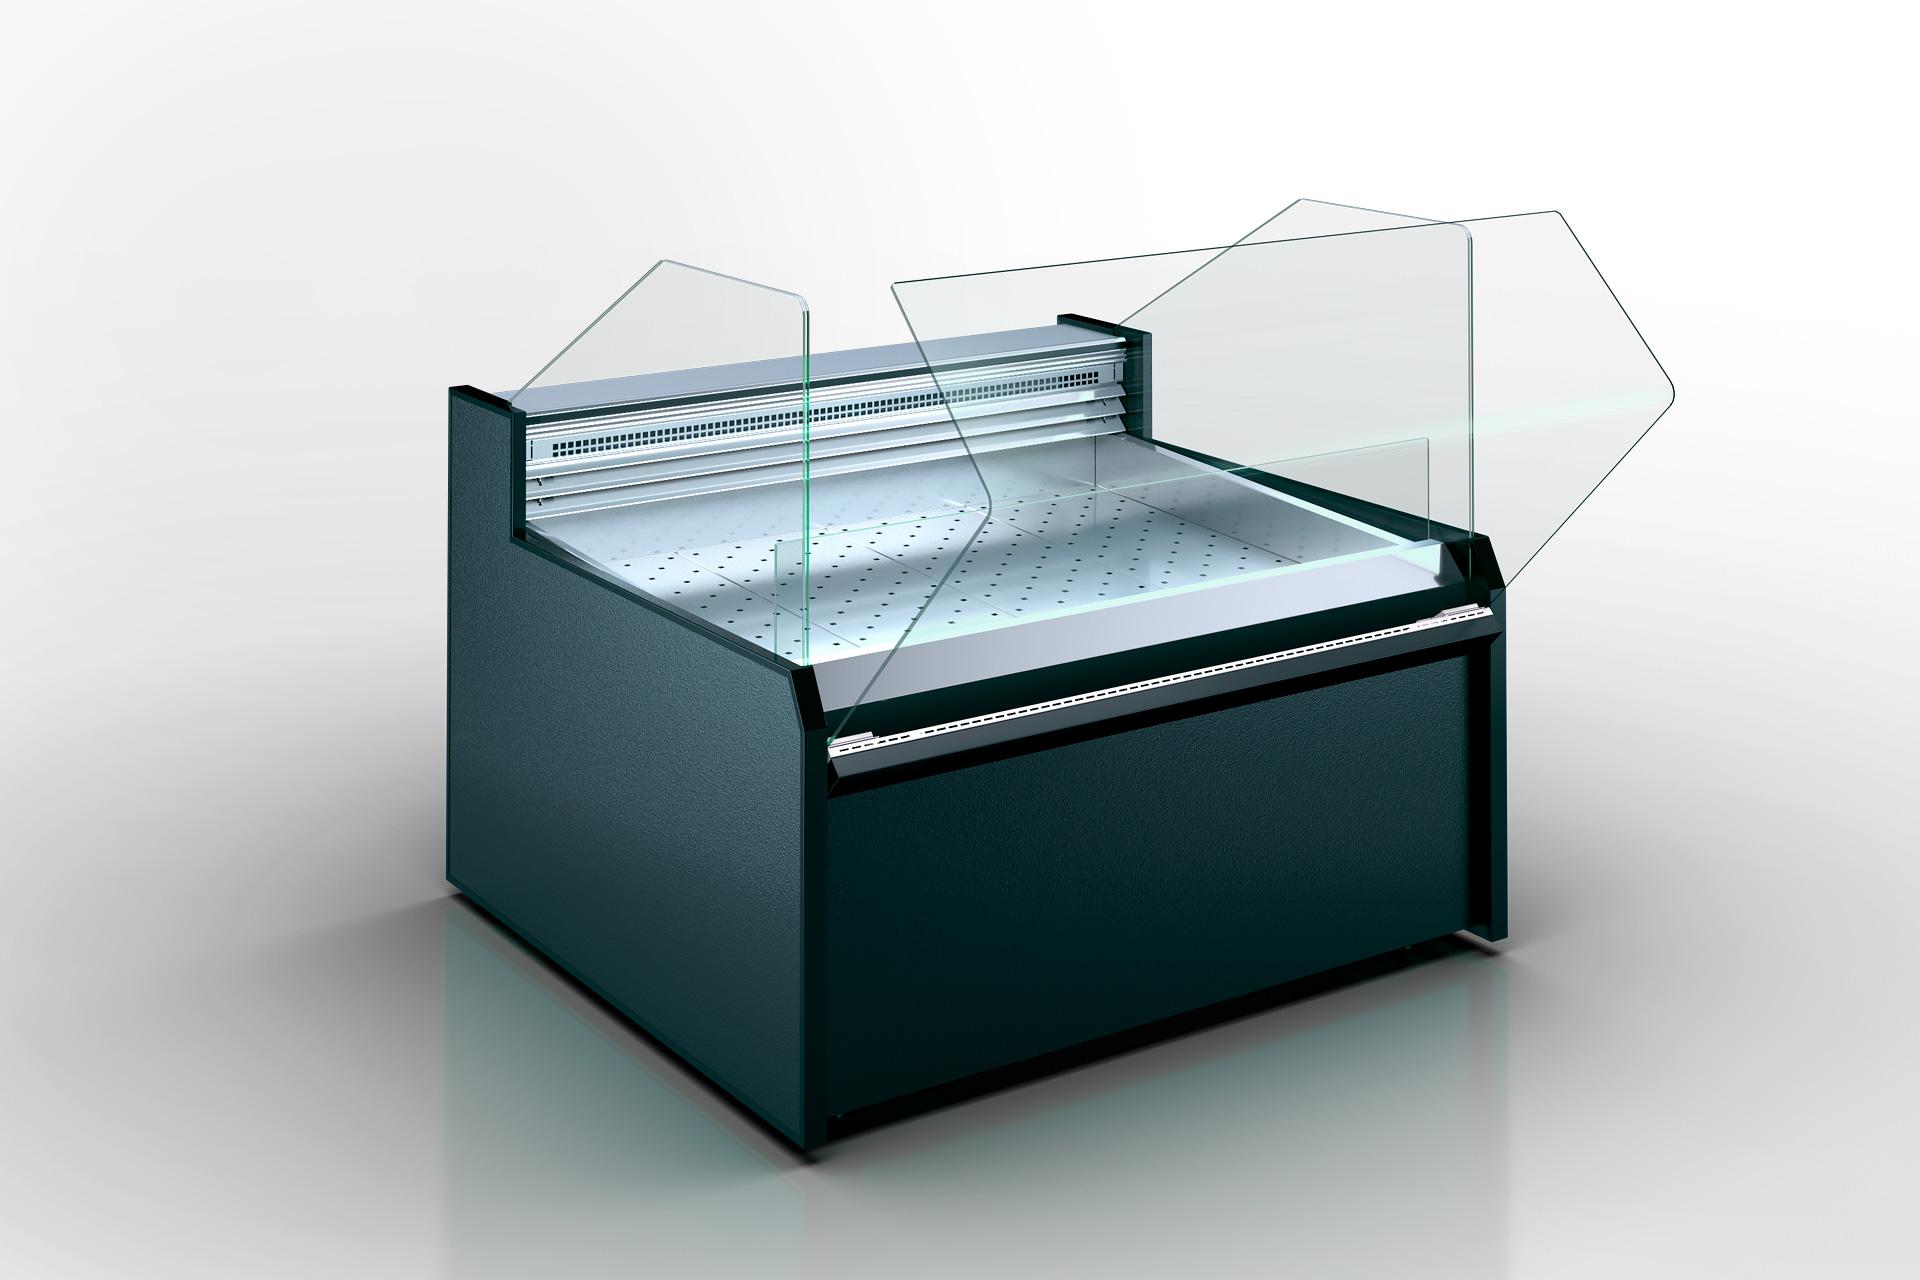 Refrigerated counters Missouri MC 120 fish OS 120-SLM/SLA, Missouri MC 120 fish OS 120-PSLM/PSLA